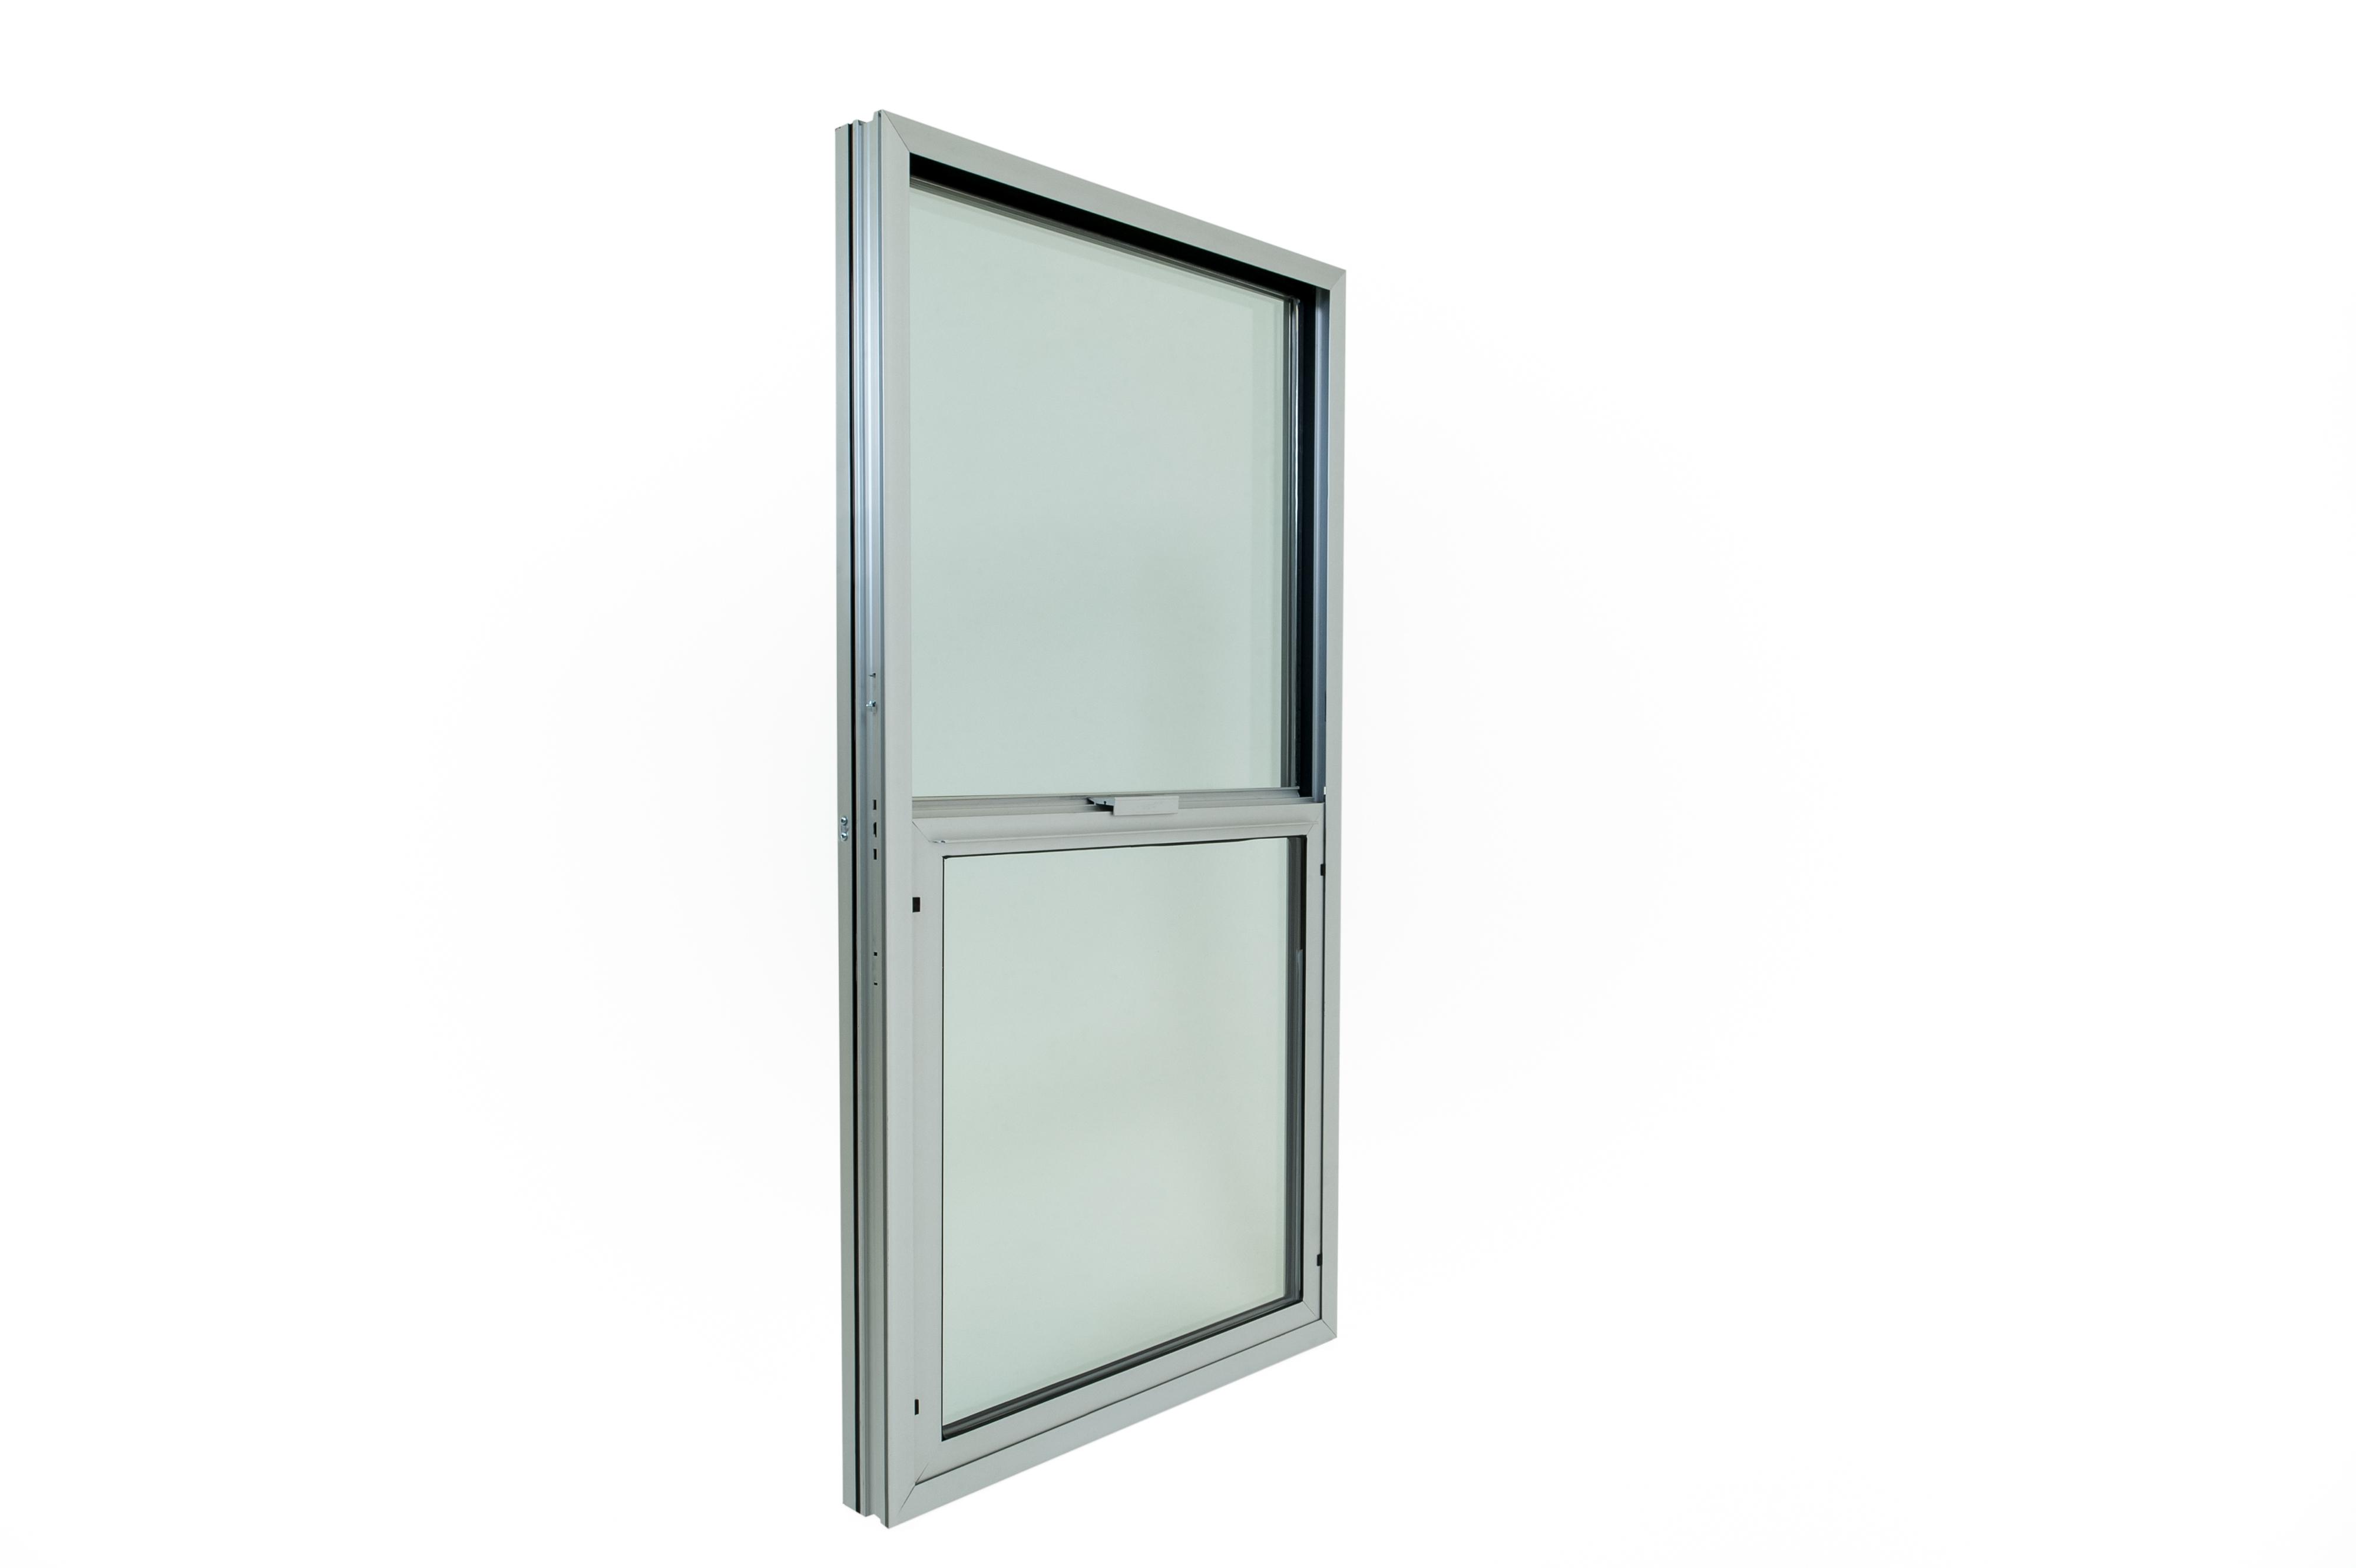 Milgard Aluminum Single Hung Window Sales And Installation